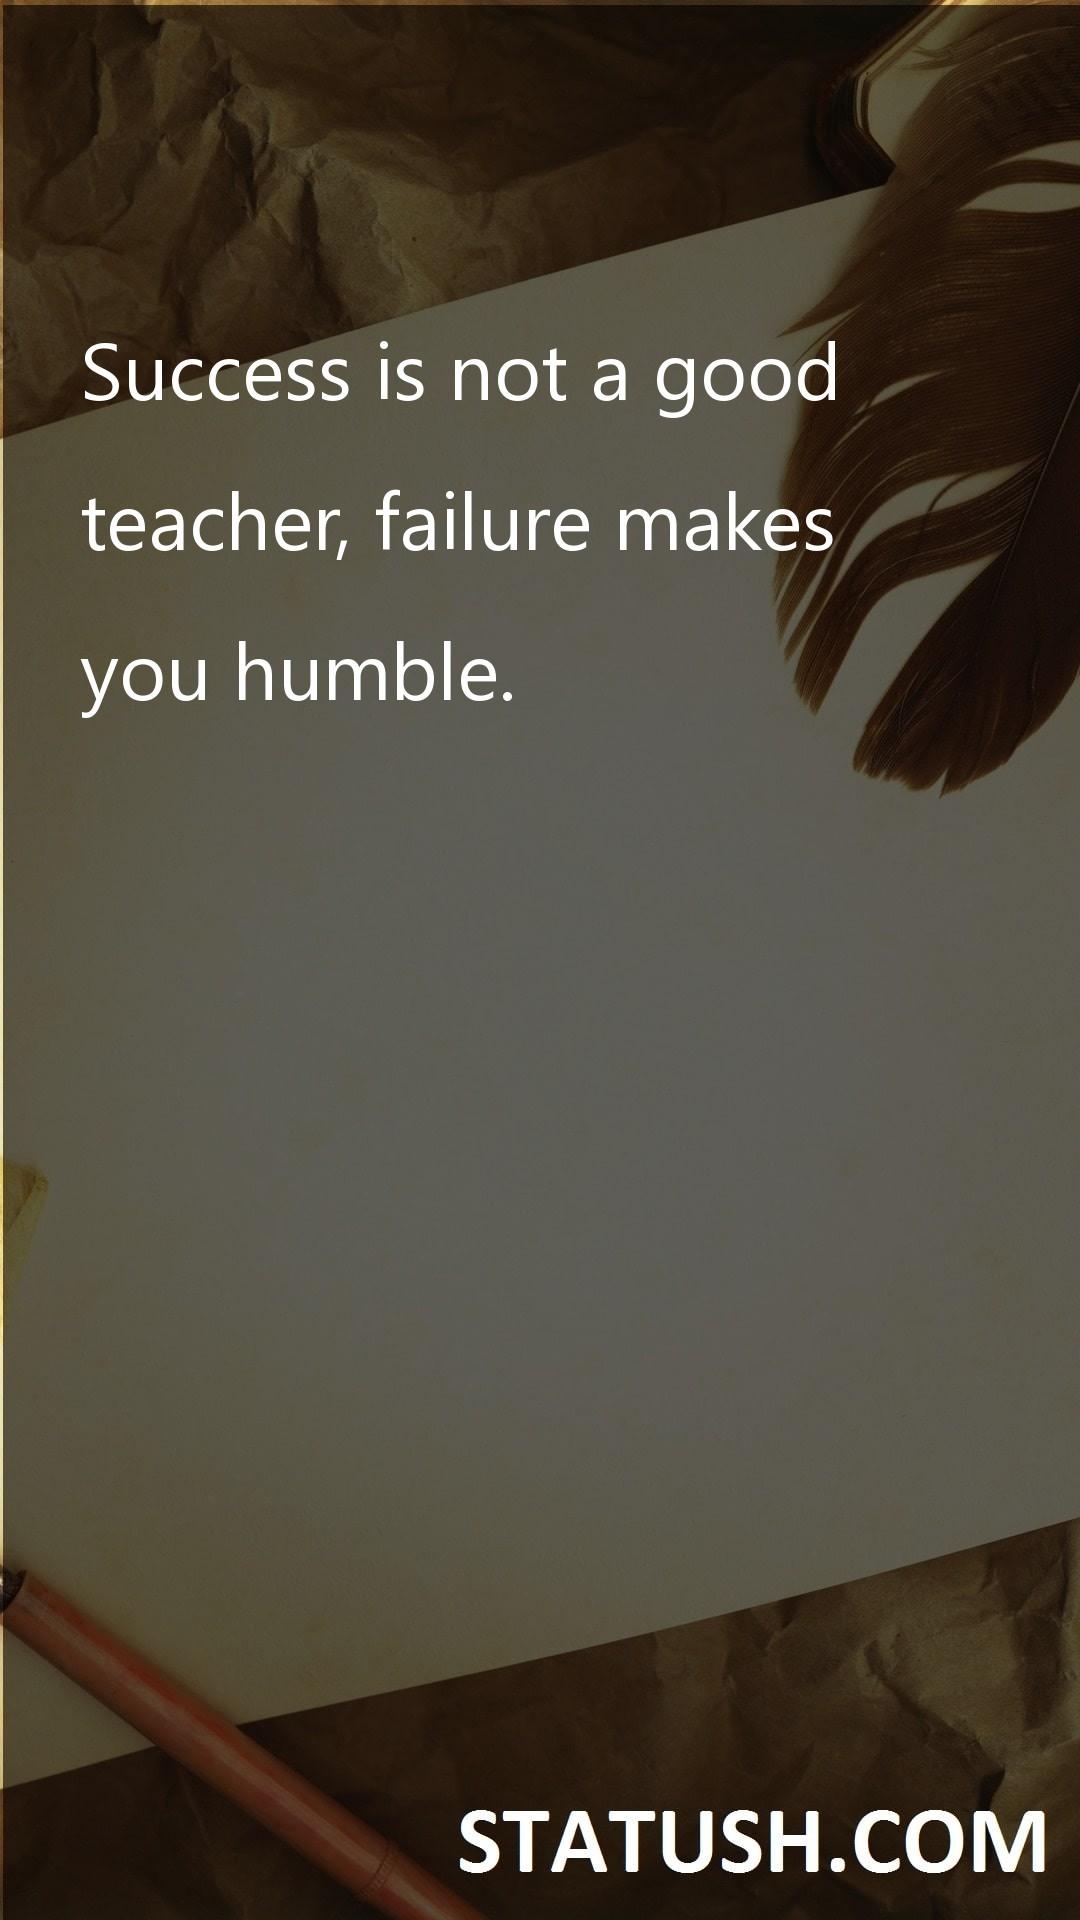 Success is not a good